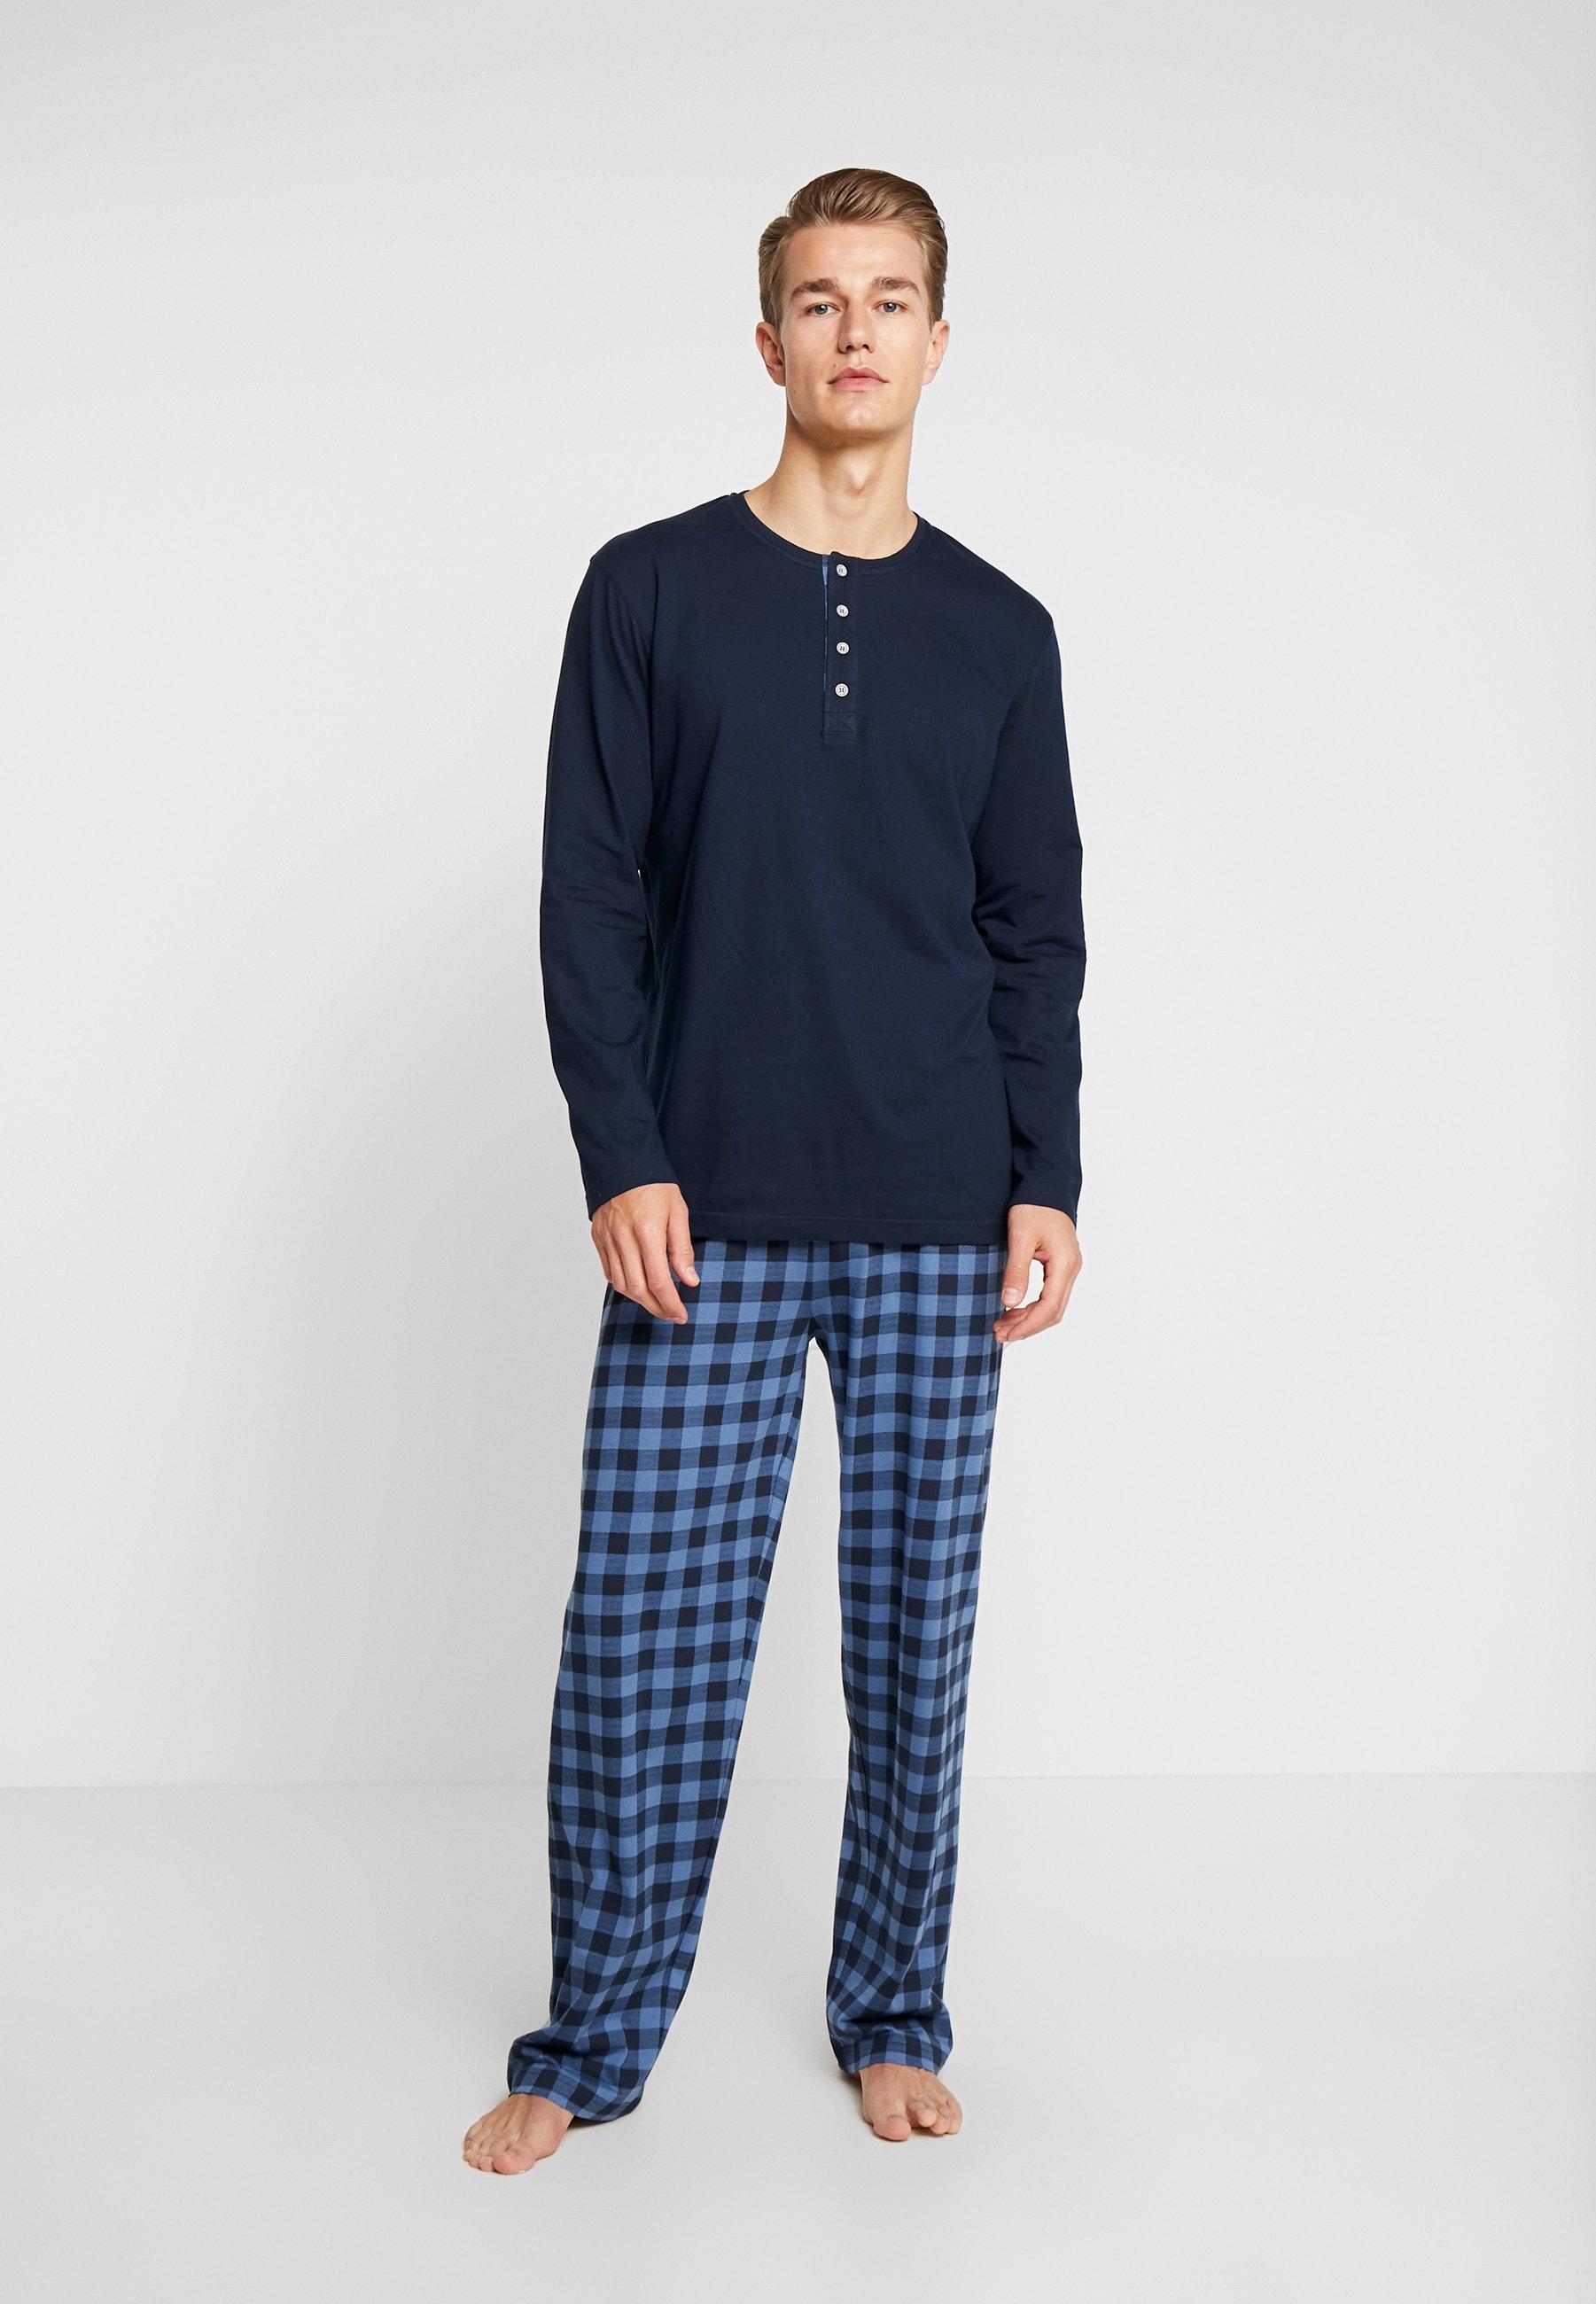 Blue Tom PyjamaDark Tom PyjamaDark Tom PyjamaDark Tailor Tom Blue Blue Tailor Tailor hQsdtrCx